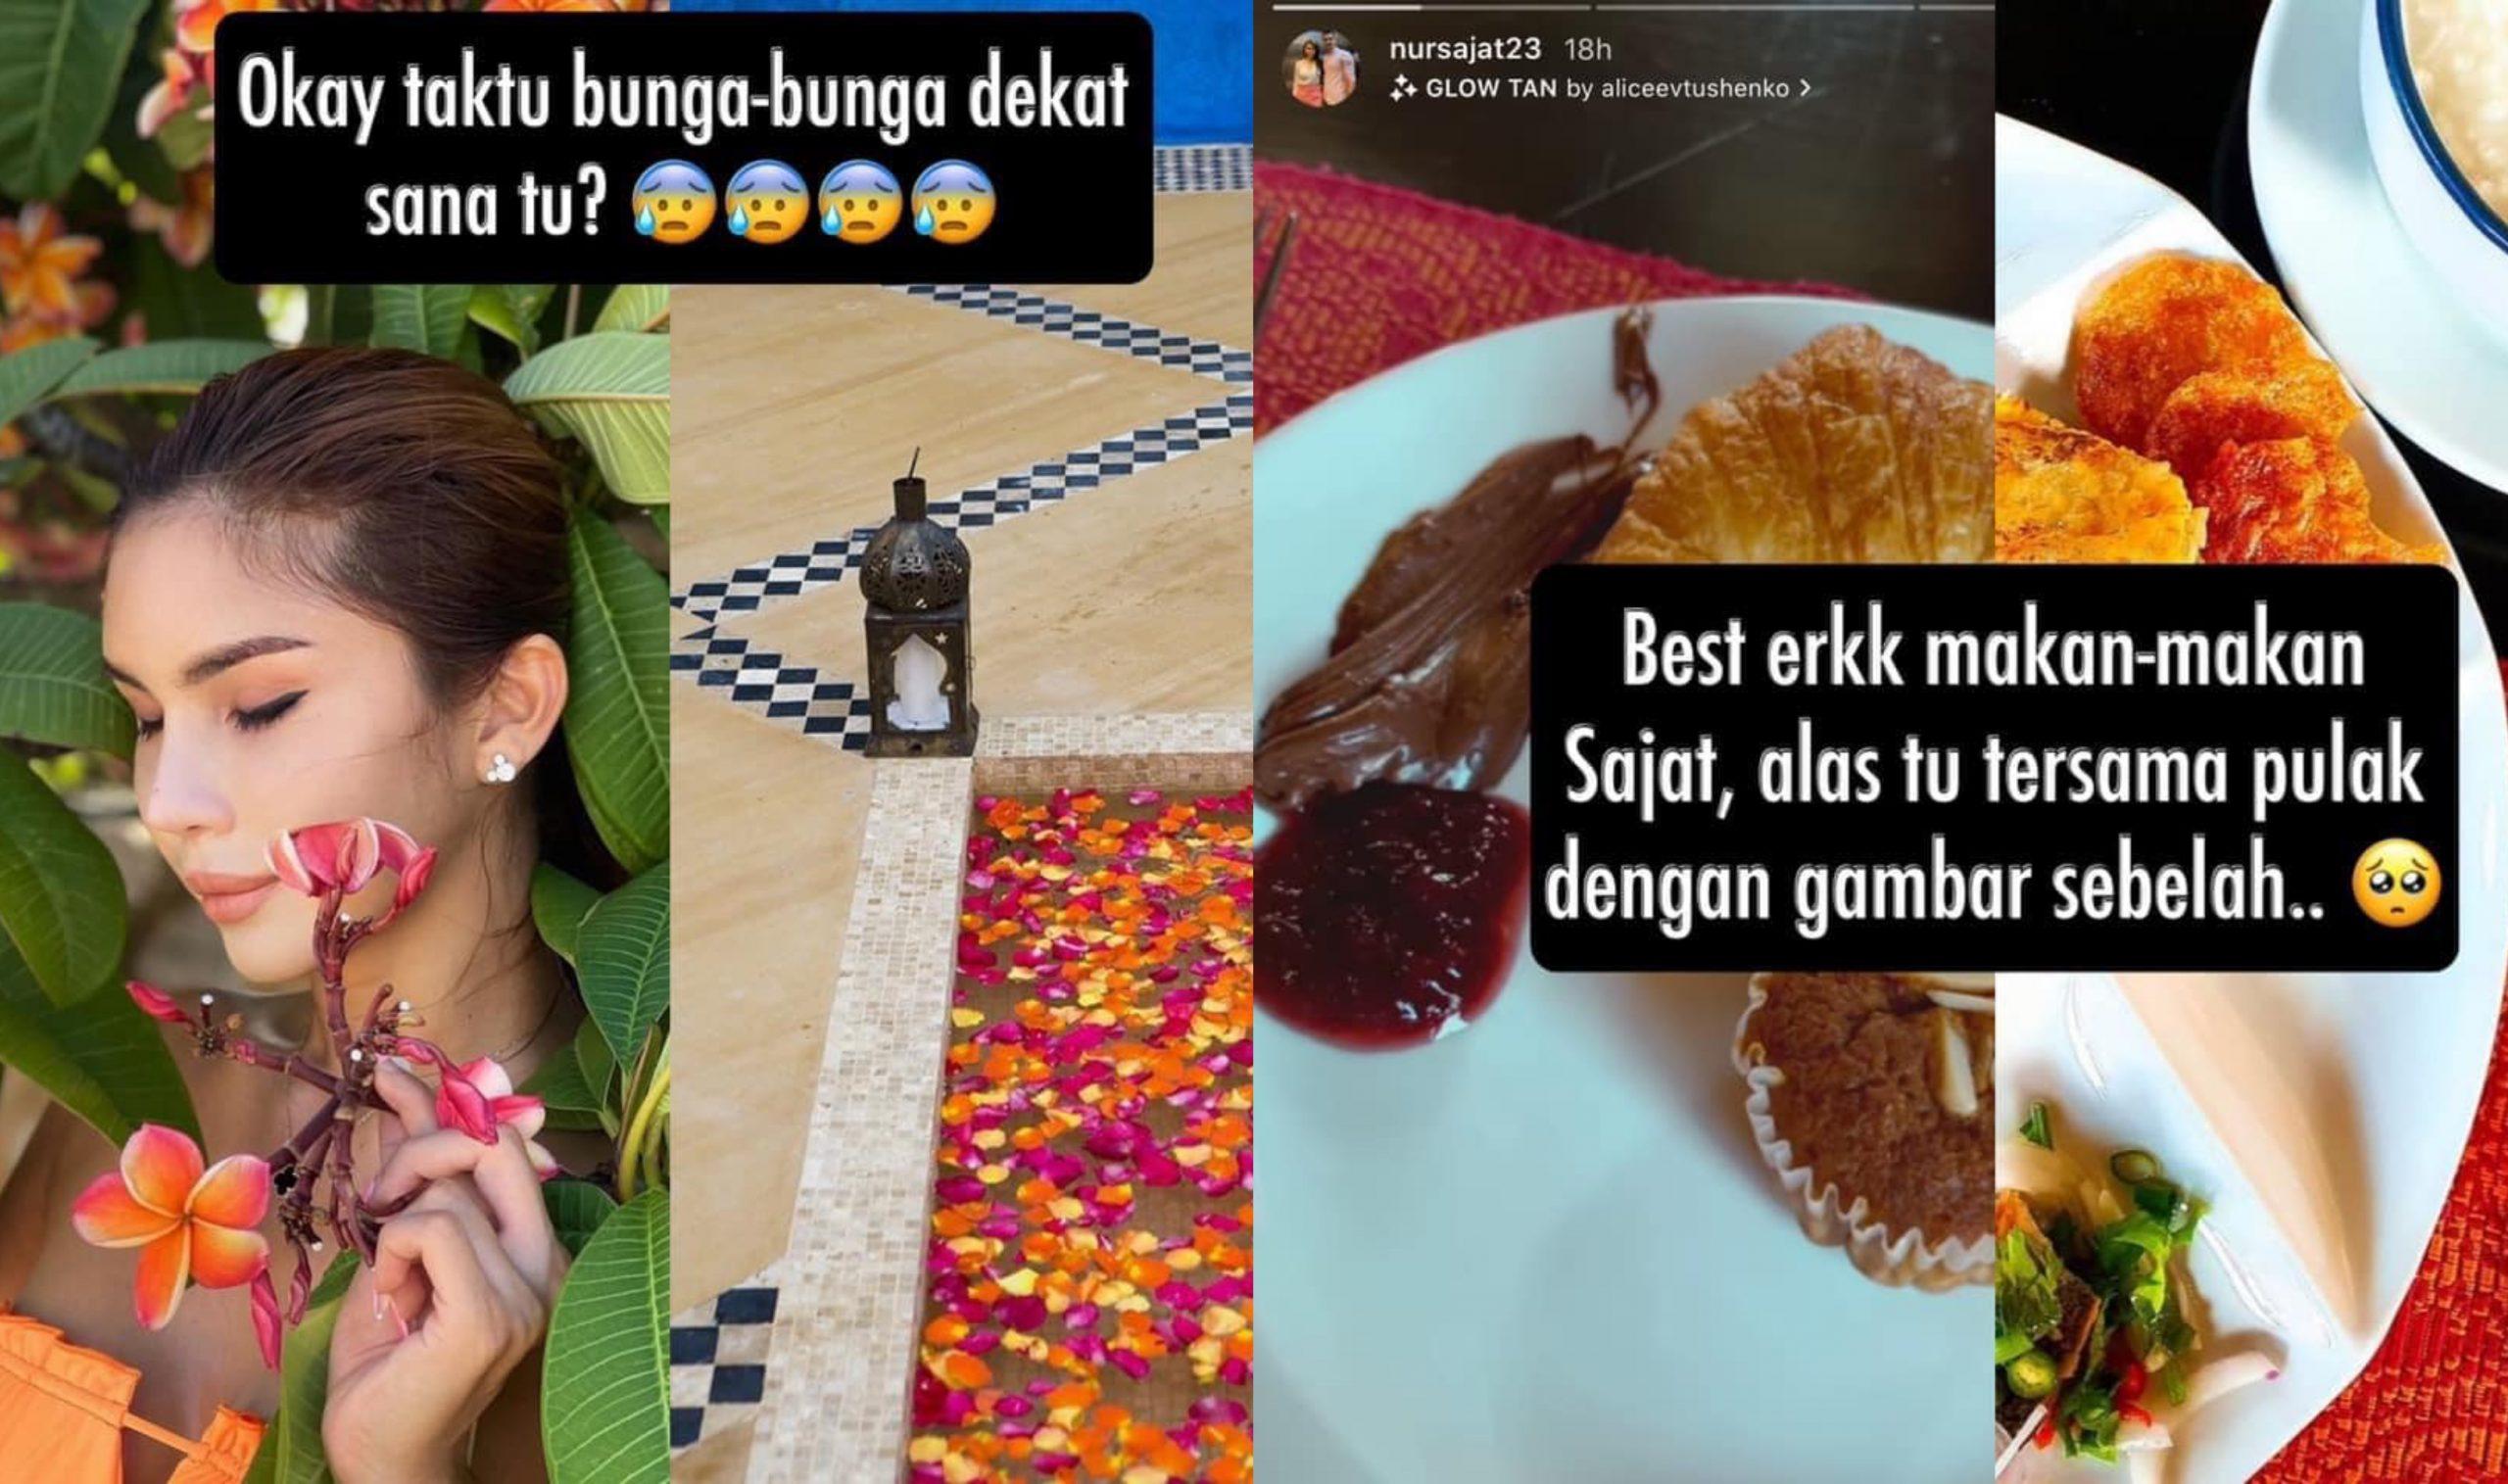 Kongsi Foto Tepi Pantai, Netizen Siasat Lokasi 'Rahsia' Sajat. Sebijik Macam Hotel Dekat… 9